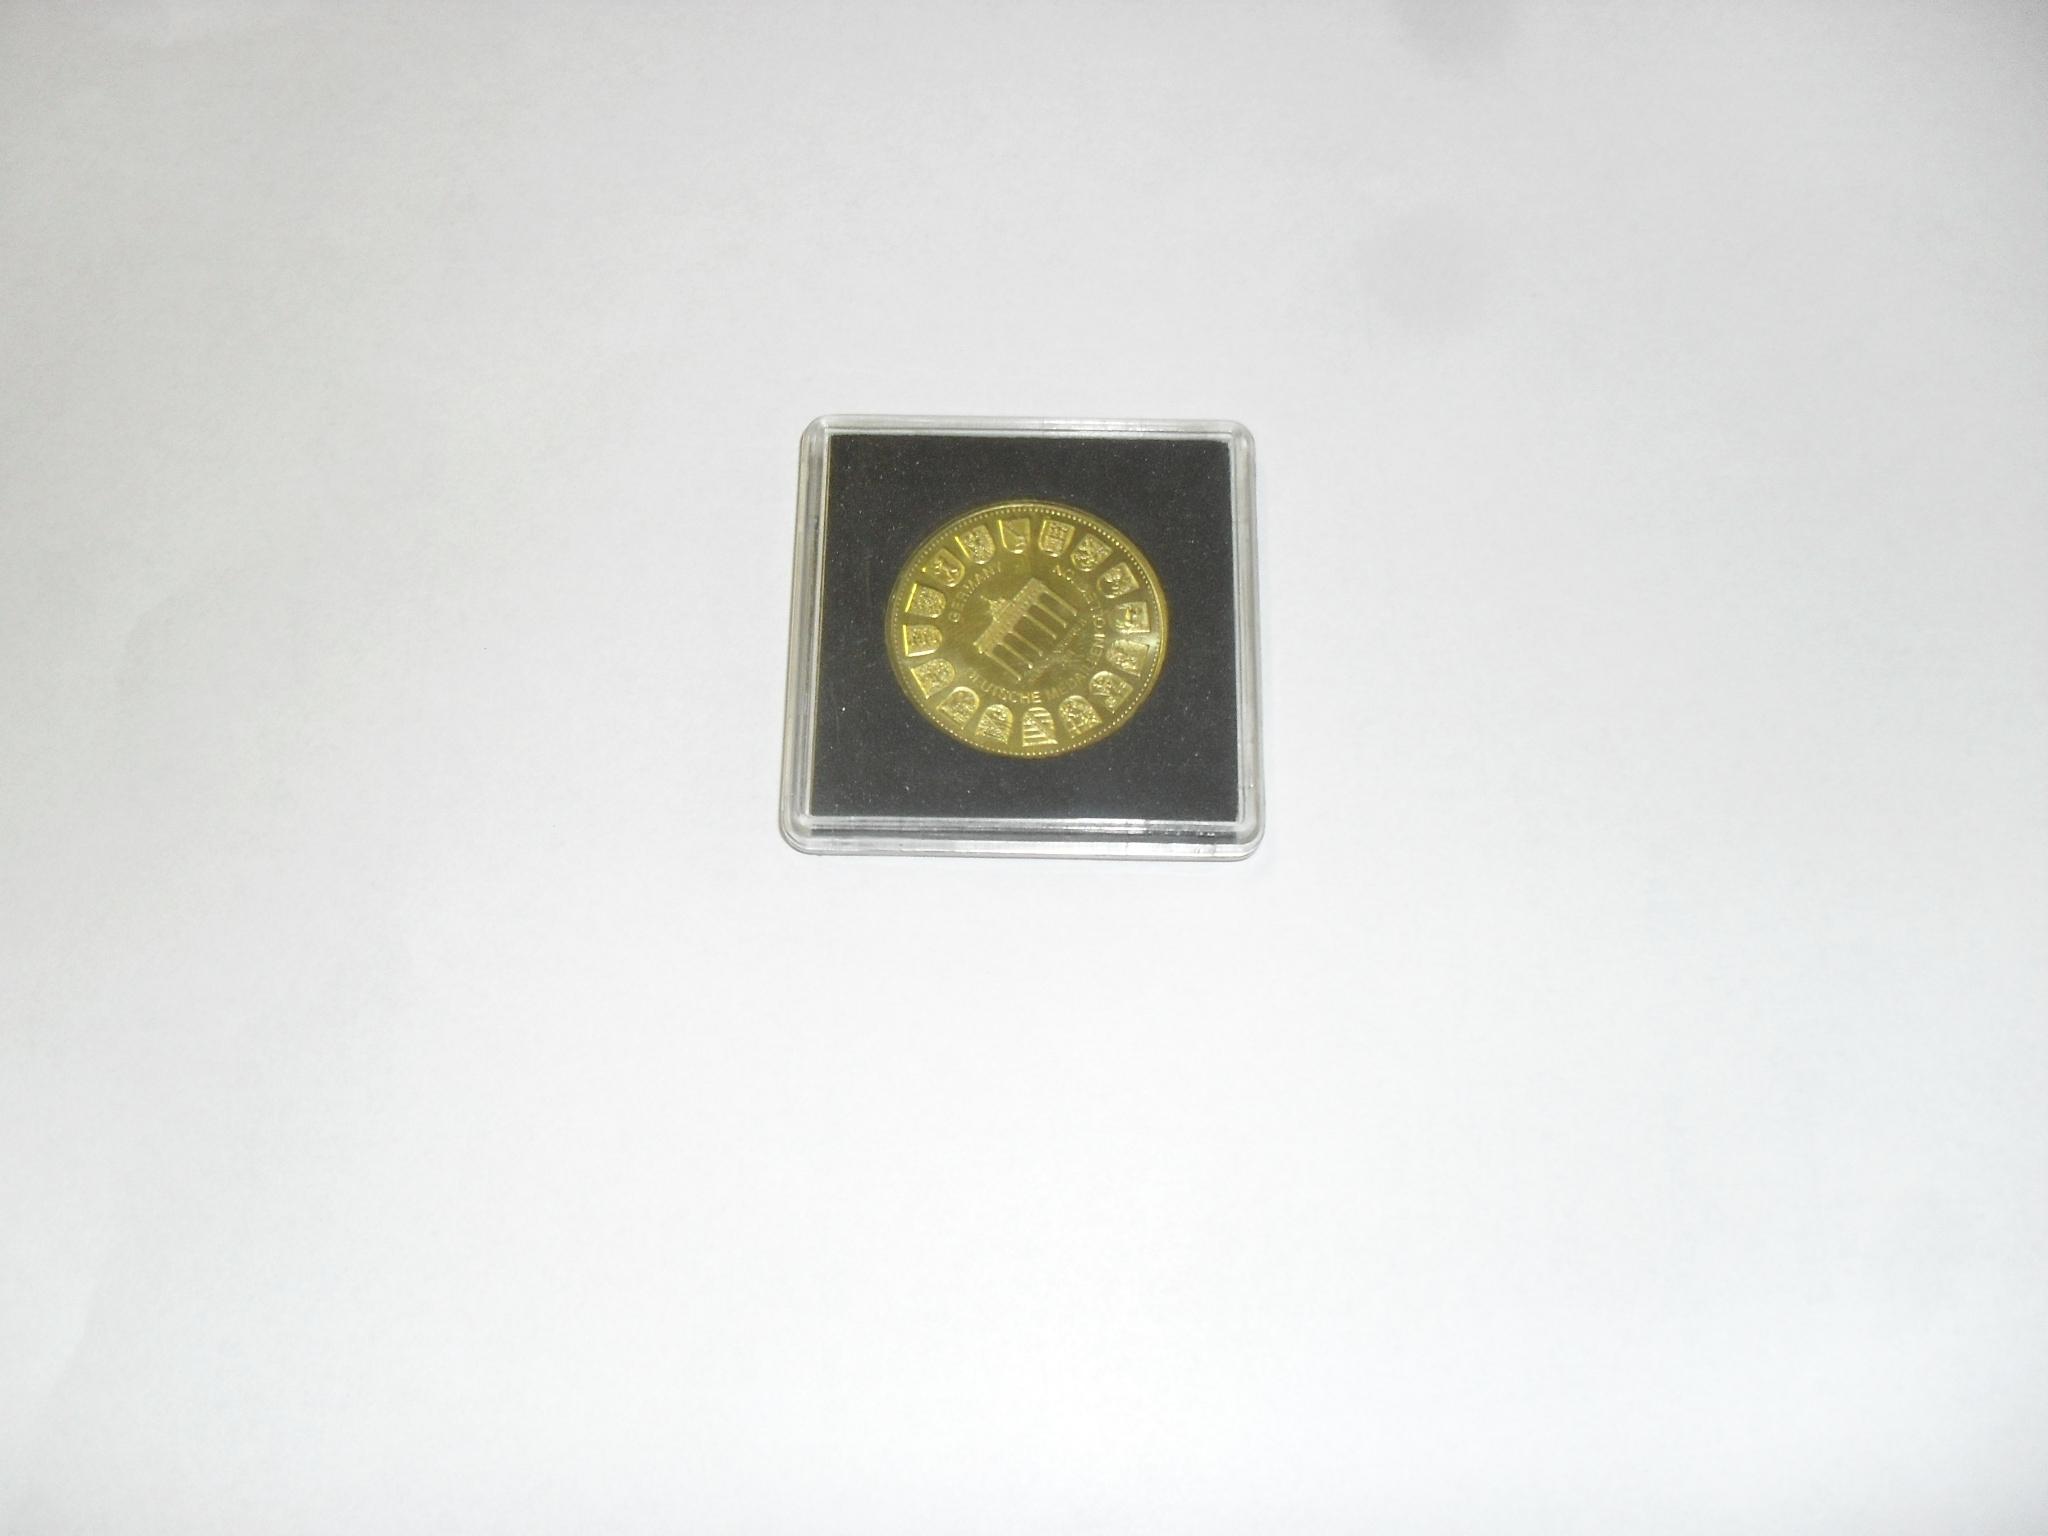 Souvenirmünzen